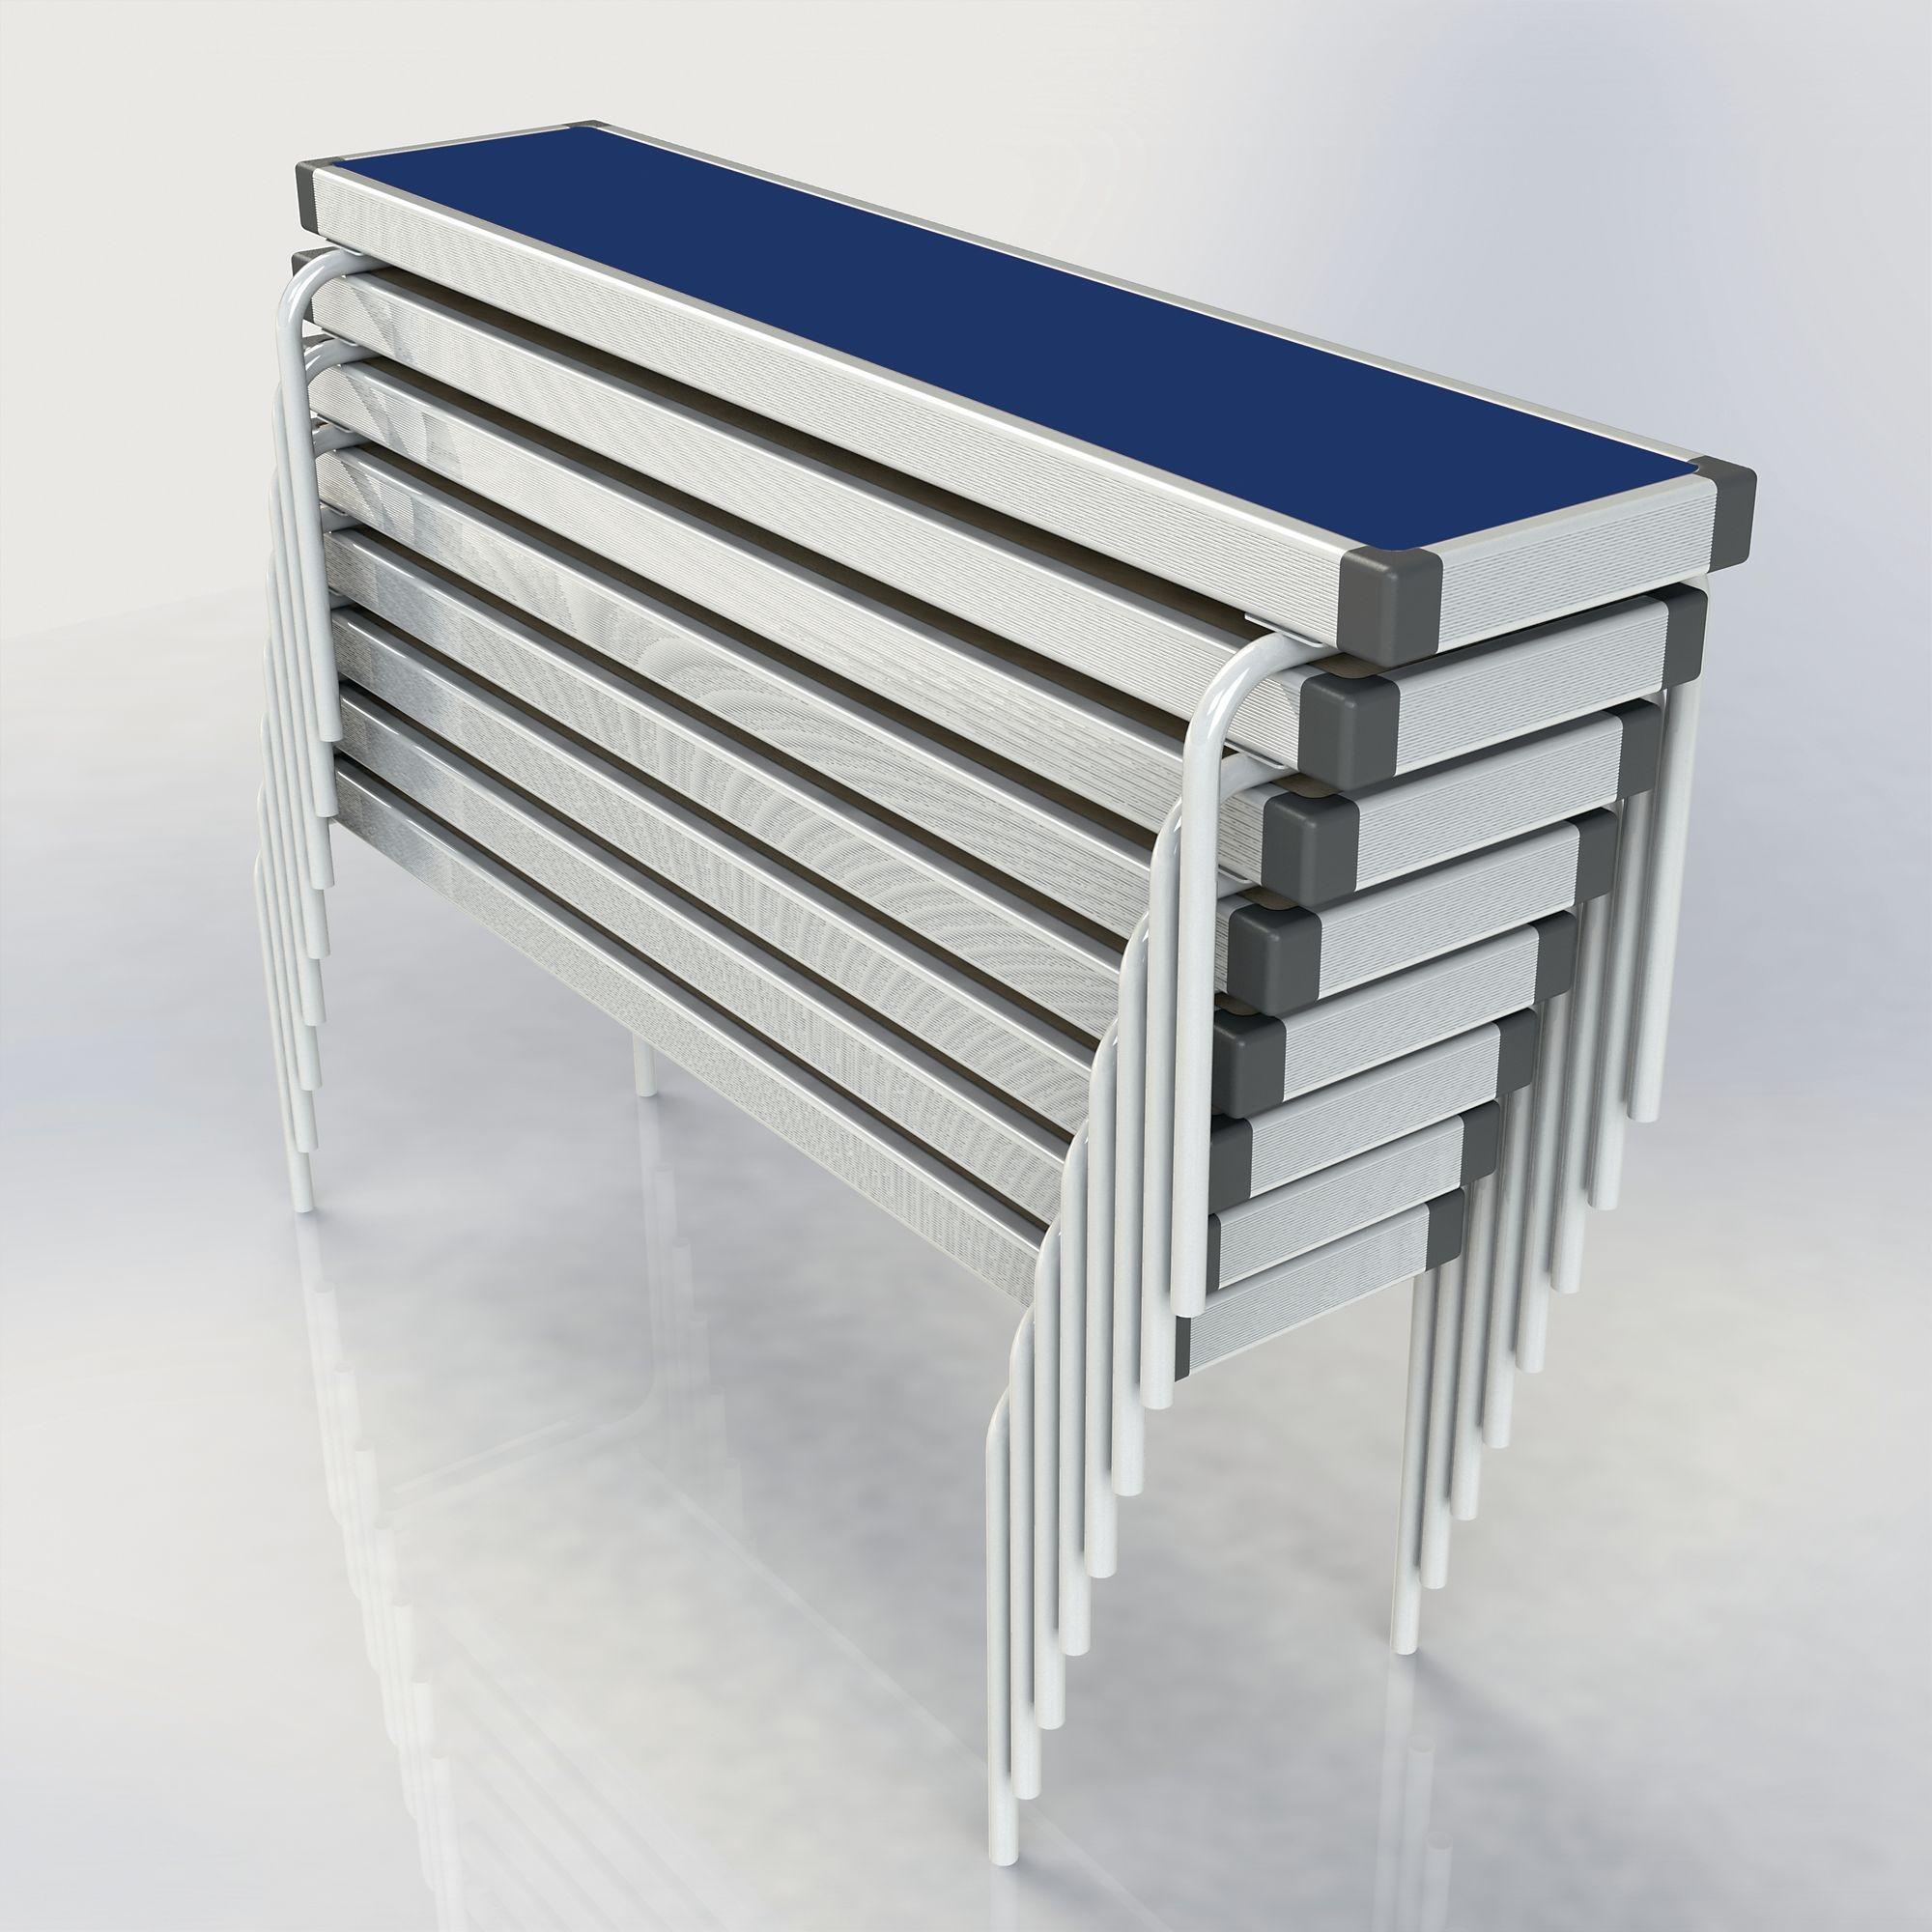 Rectangular Benches L1220 x H330 x W254mm White